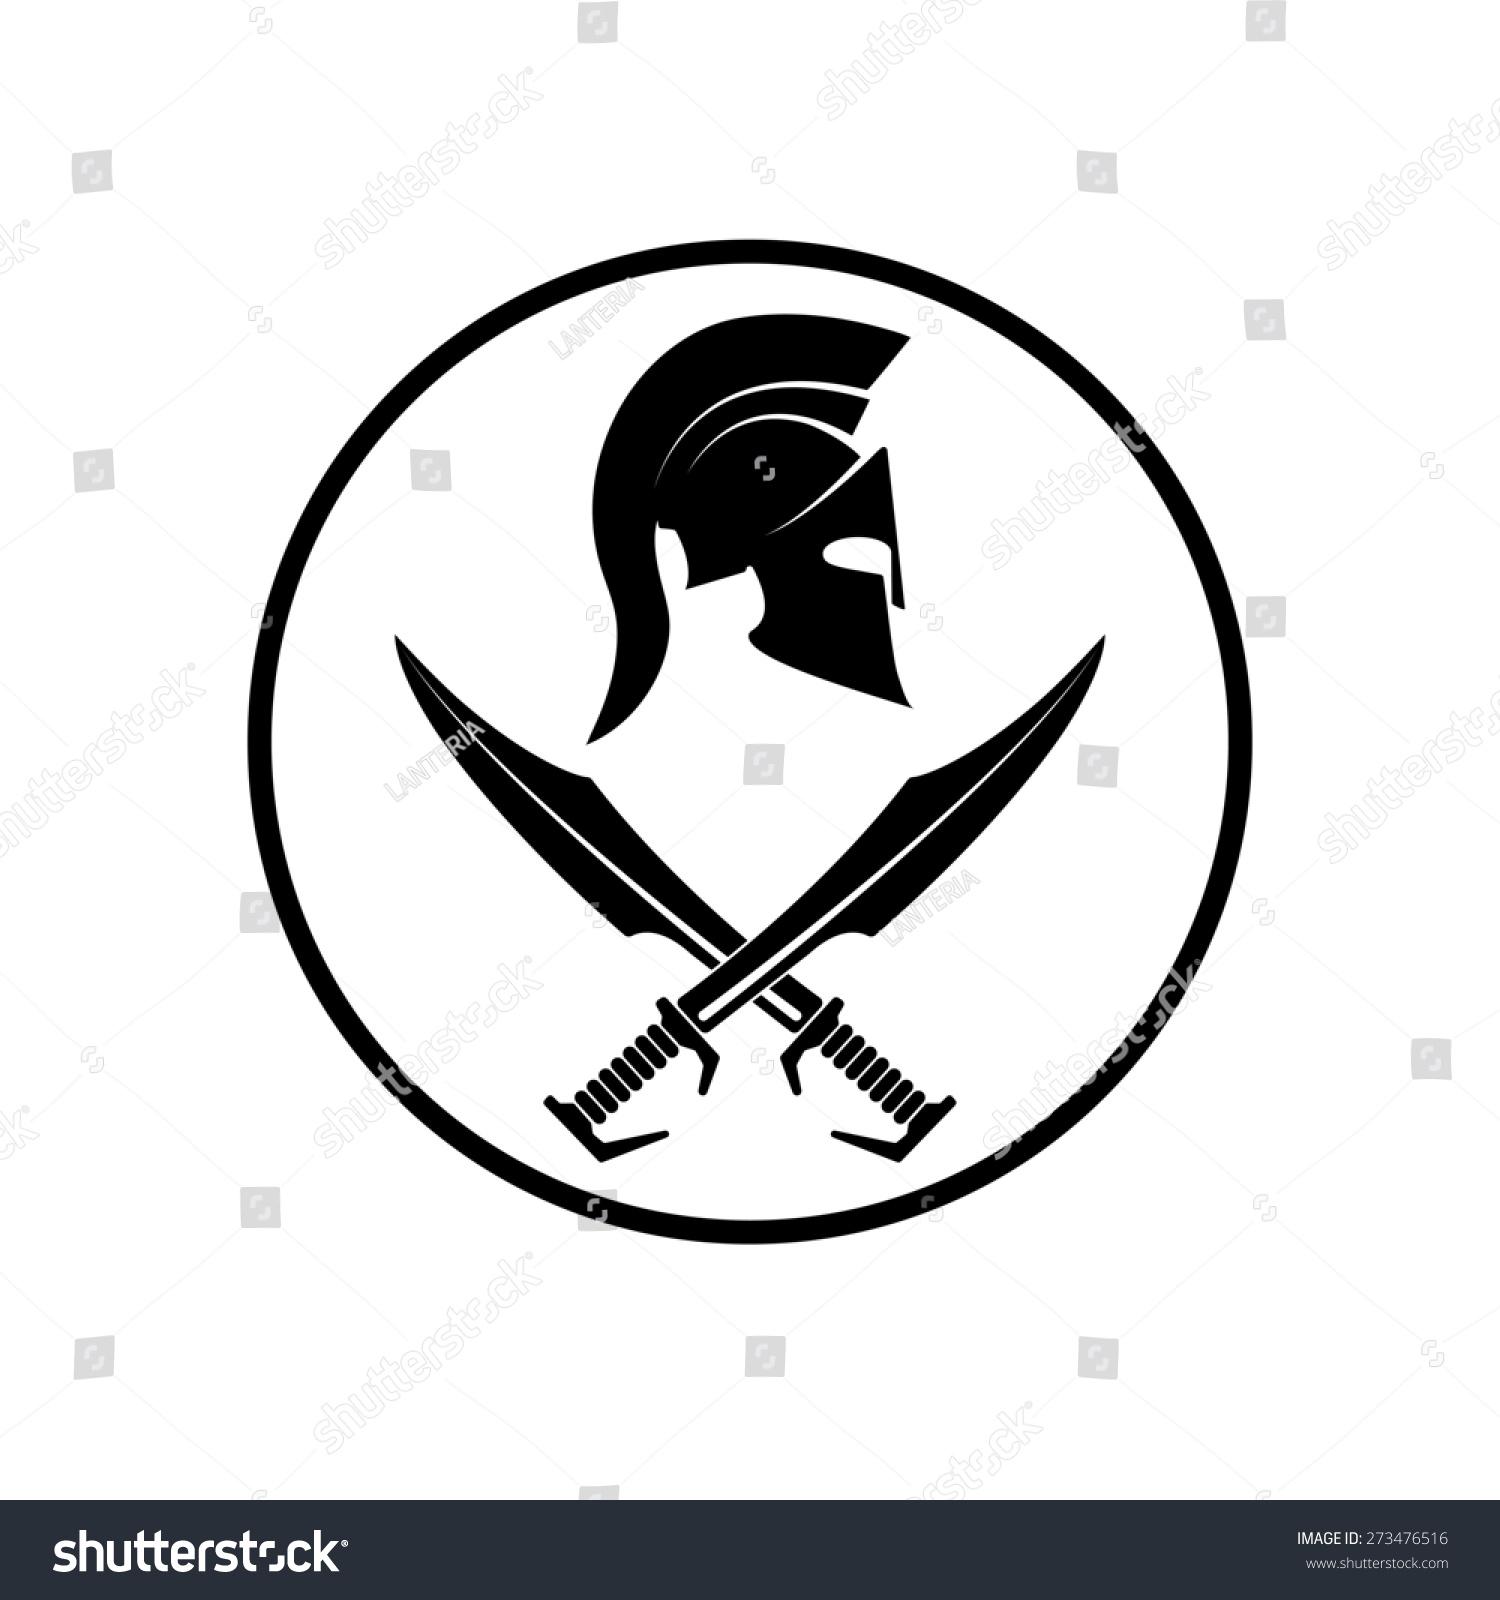 Spartan warrior symbols view symbol biocorpaavc Choice Image